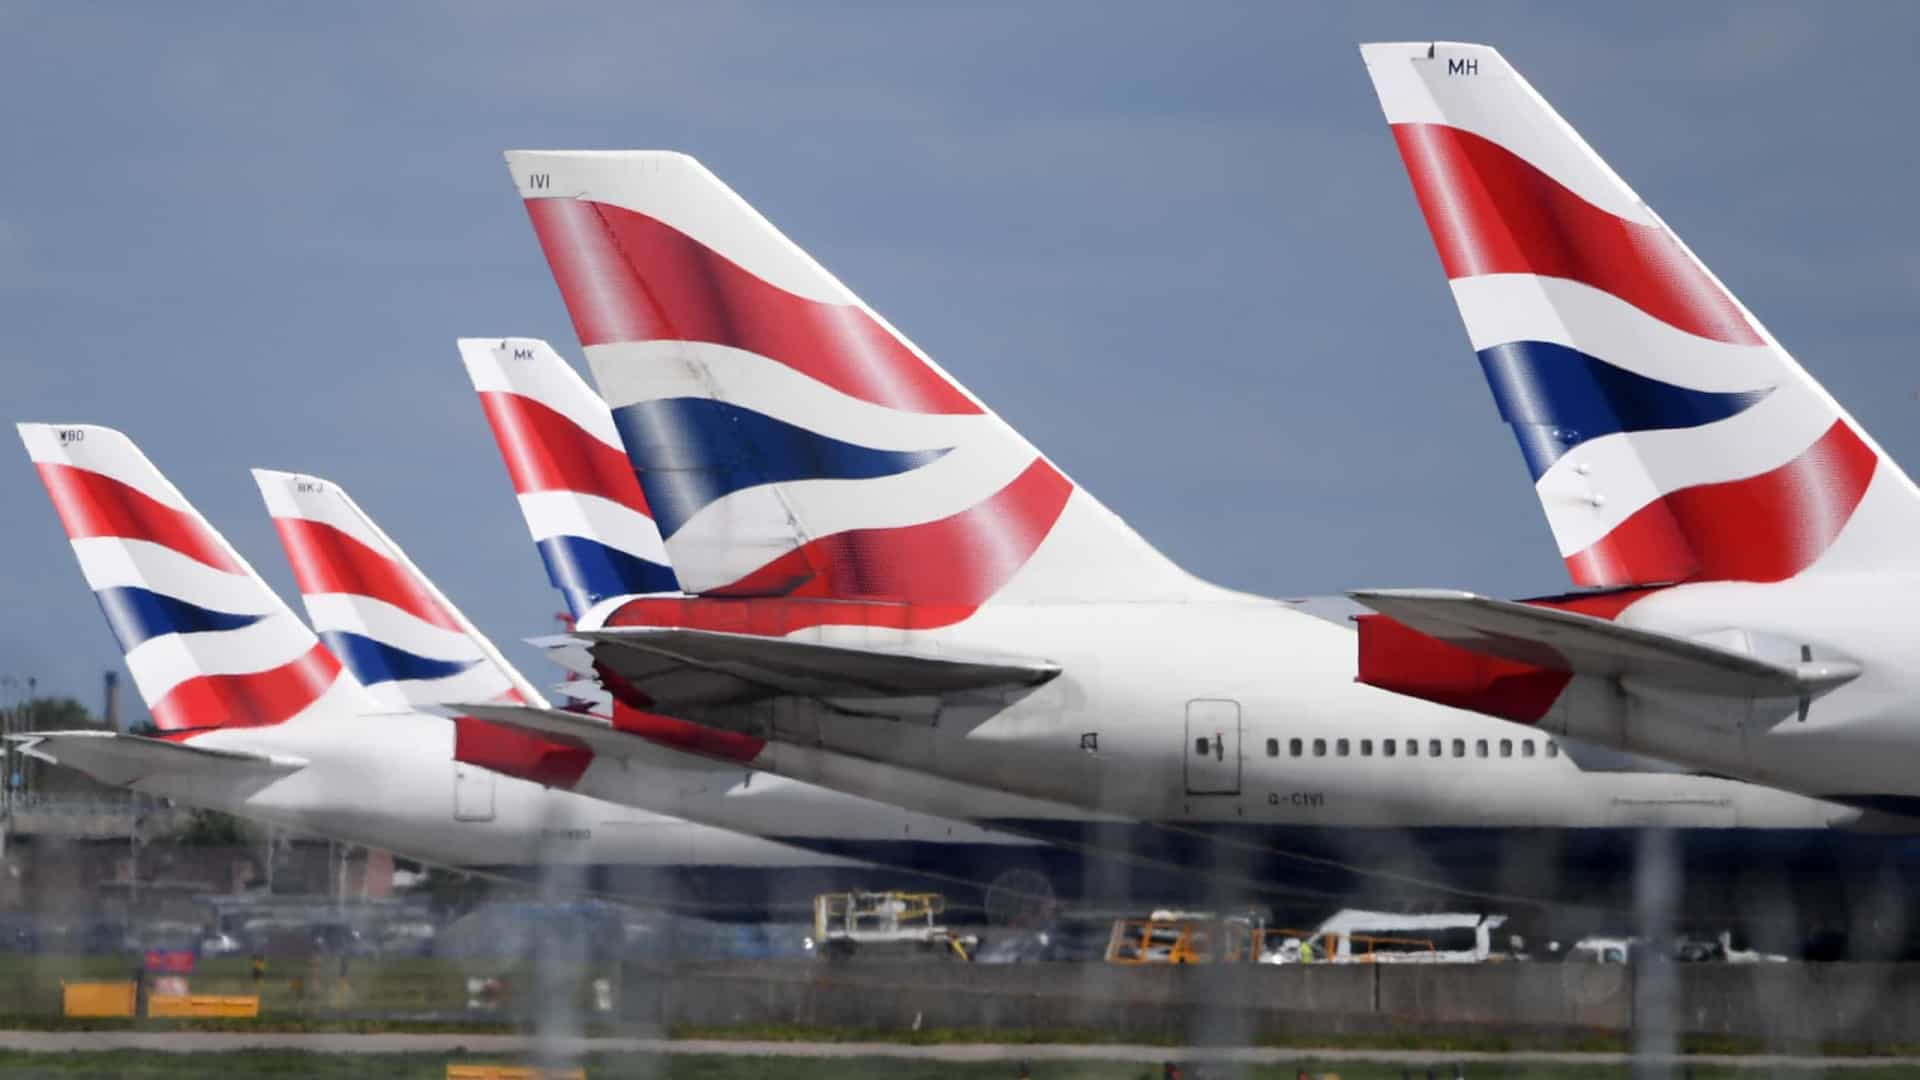 Pilotos da British Airways aceitam cortes salariais e despedimentos